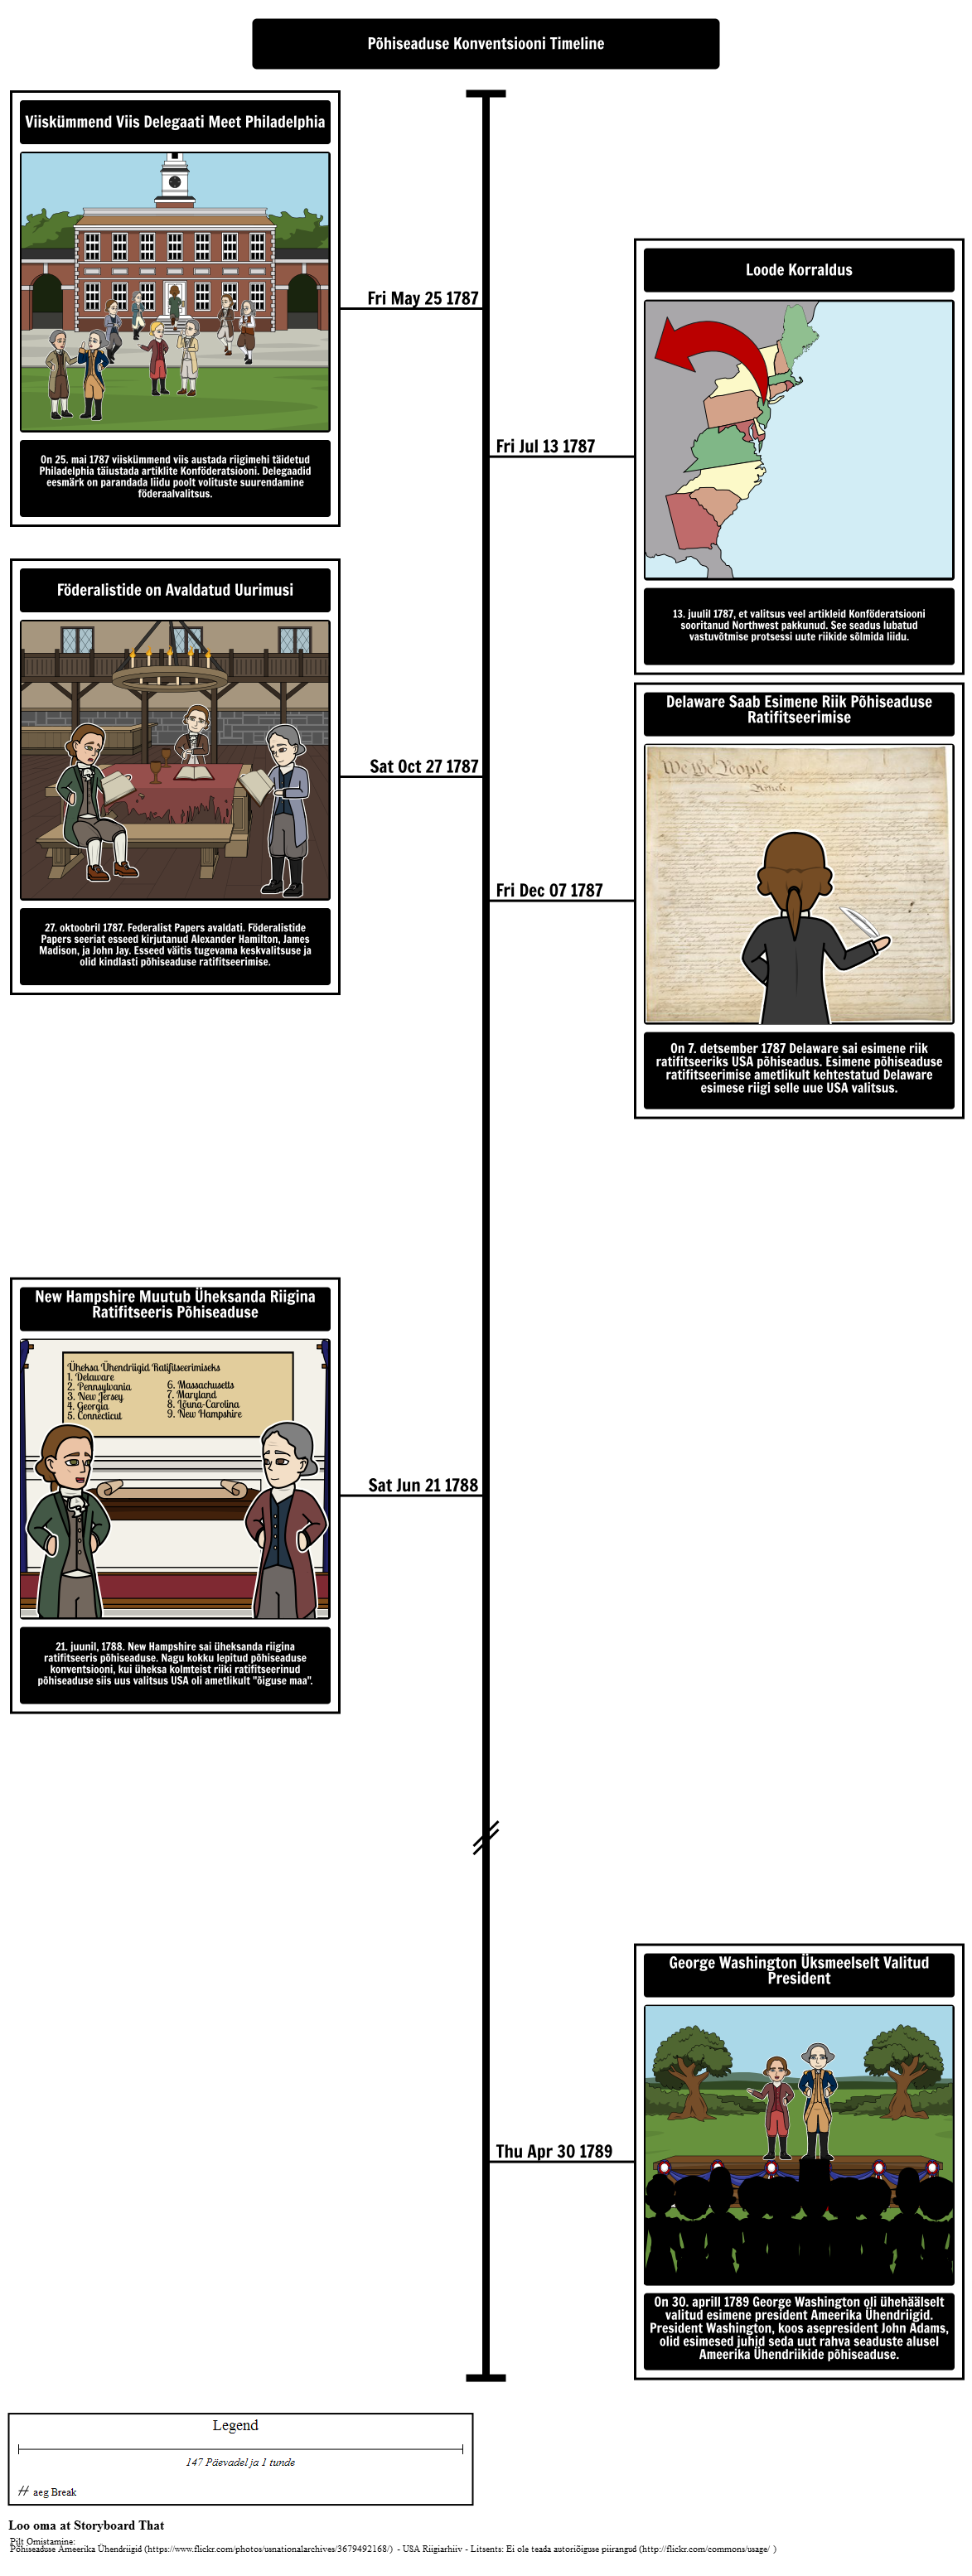 1a48a082499 Põhiseaduse Konvendi Timeline Storyboard par et-examples